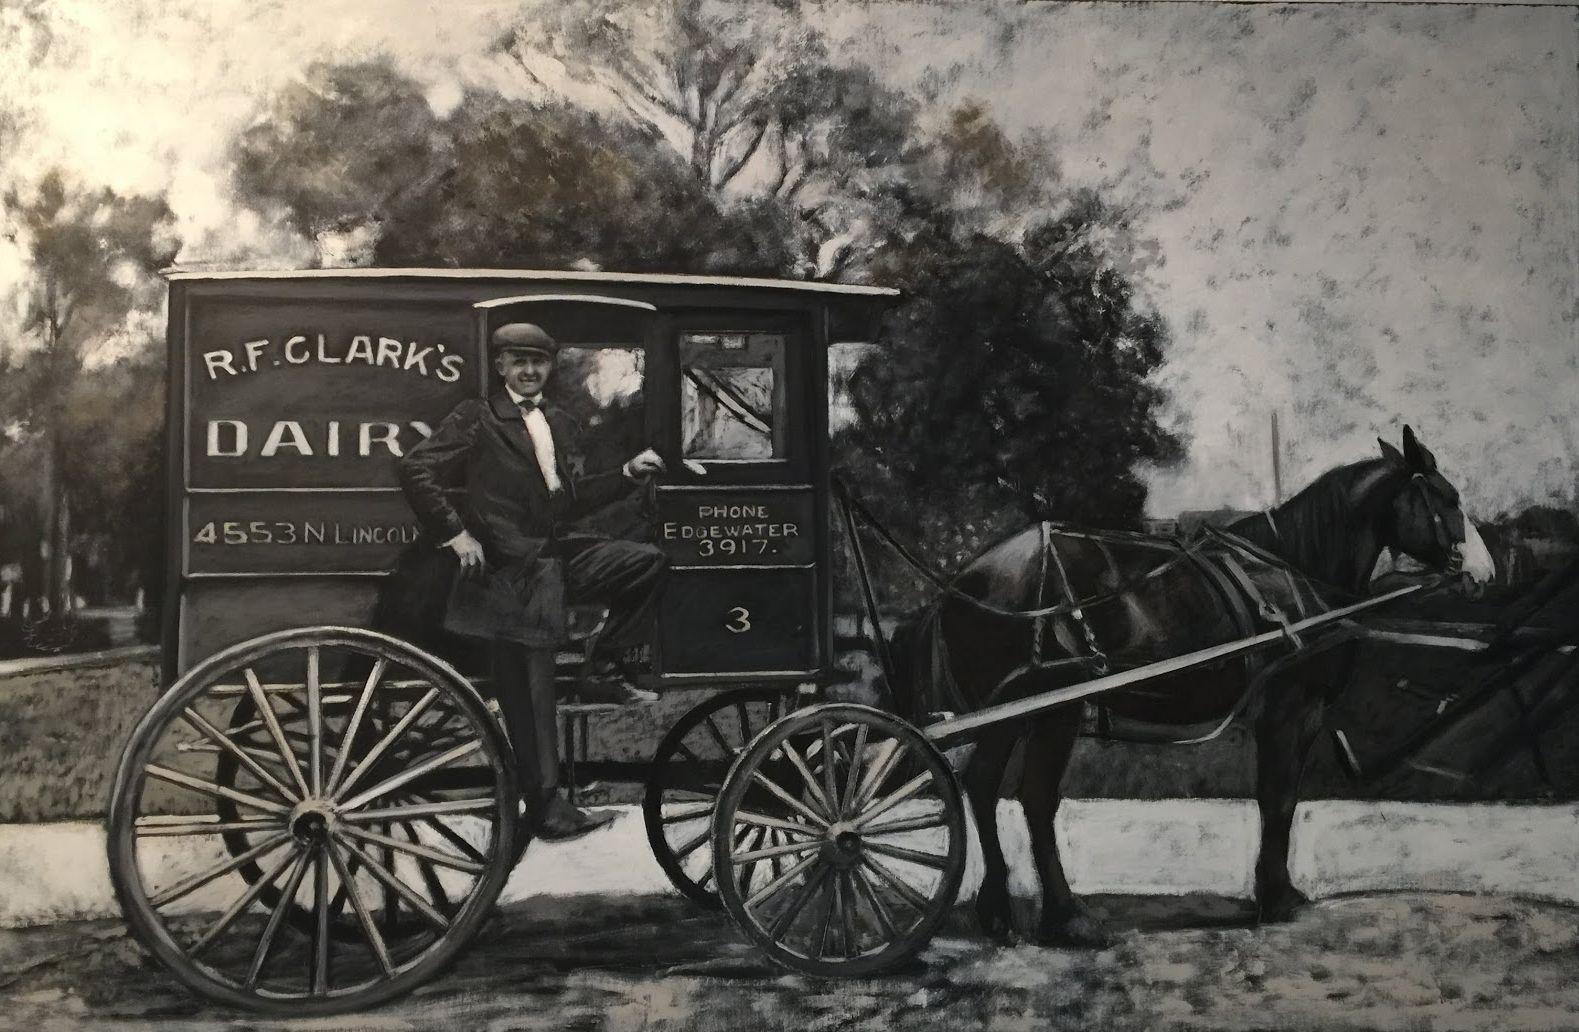 Robert F. Clark Dairy.jpg